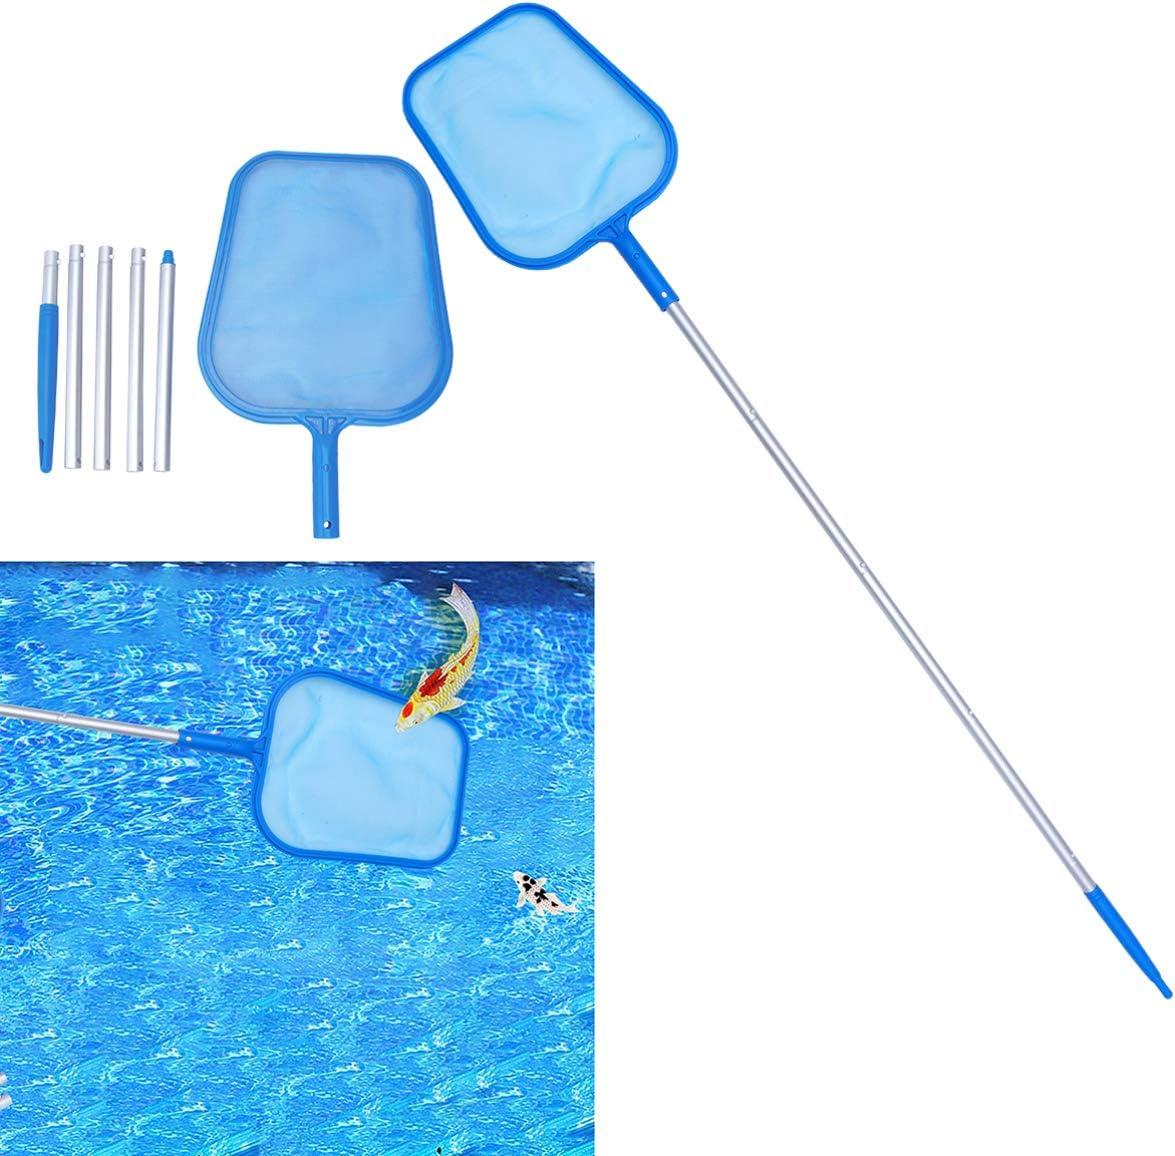 Cabilock Pool Supply Professional Swimming Pool Leaf Skimmer Net Aluminum Pole Fine Mesh Netting Bag Basket for Fast Cleaning of the Finest Debris Clean Spas Ponds 122cm